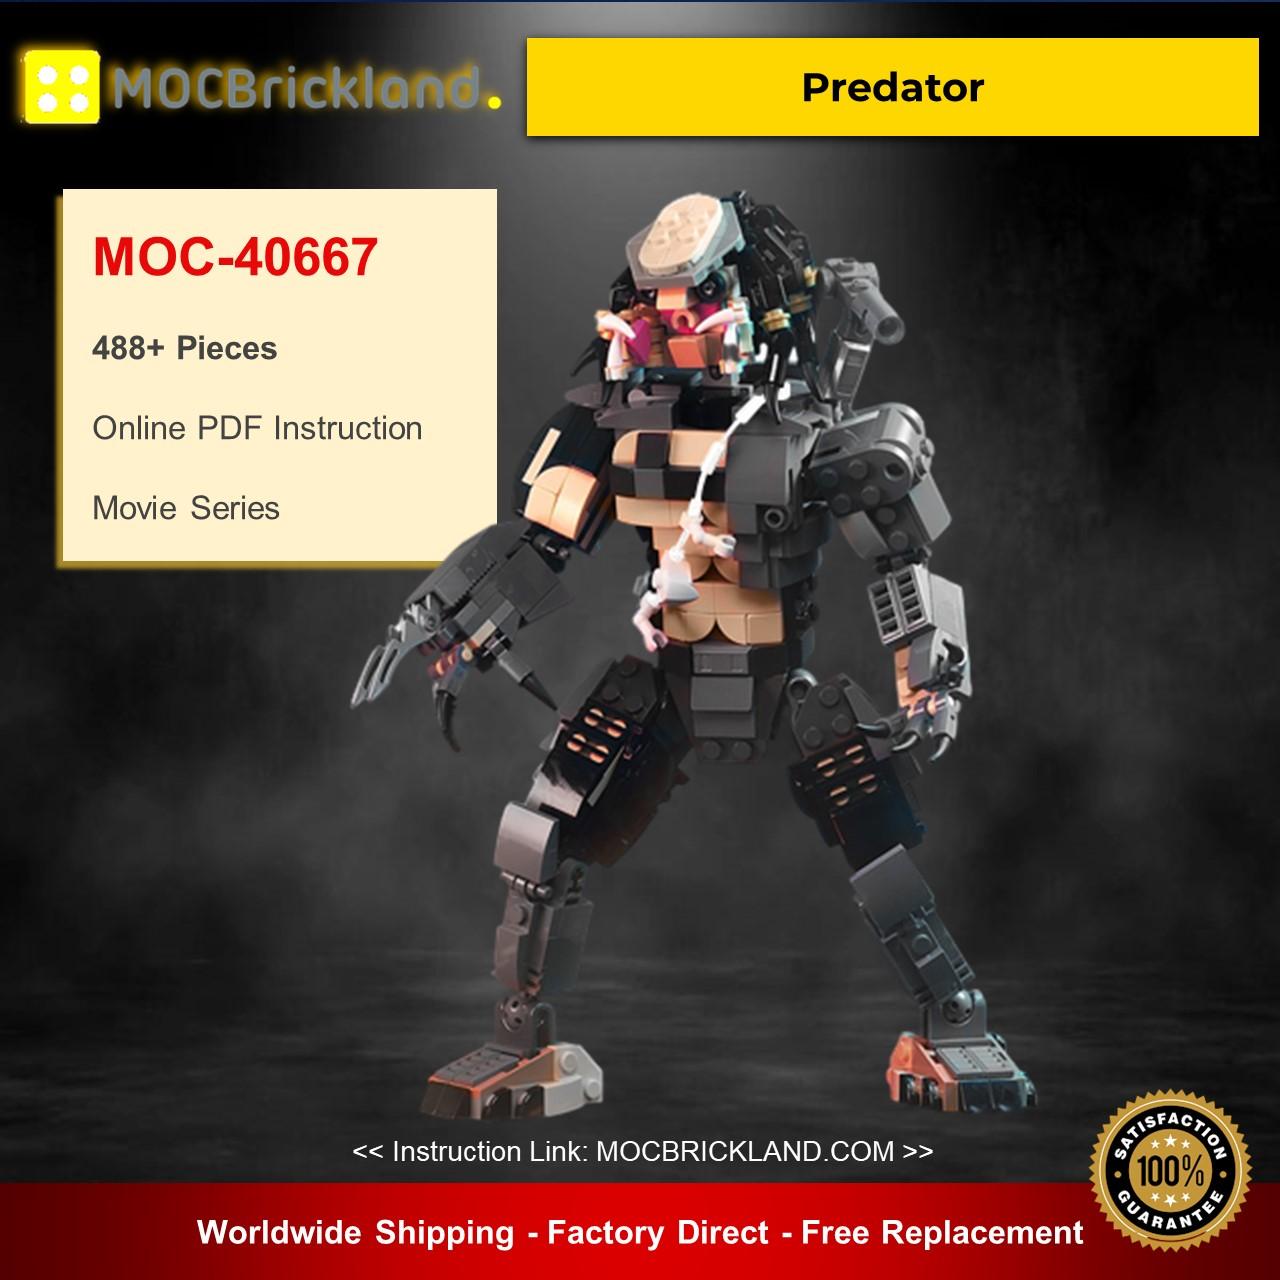 Predator MOC-40667 Movie Designed By buildbetterbricks With 488 Pieces